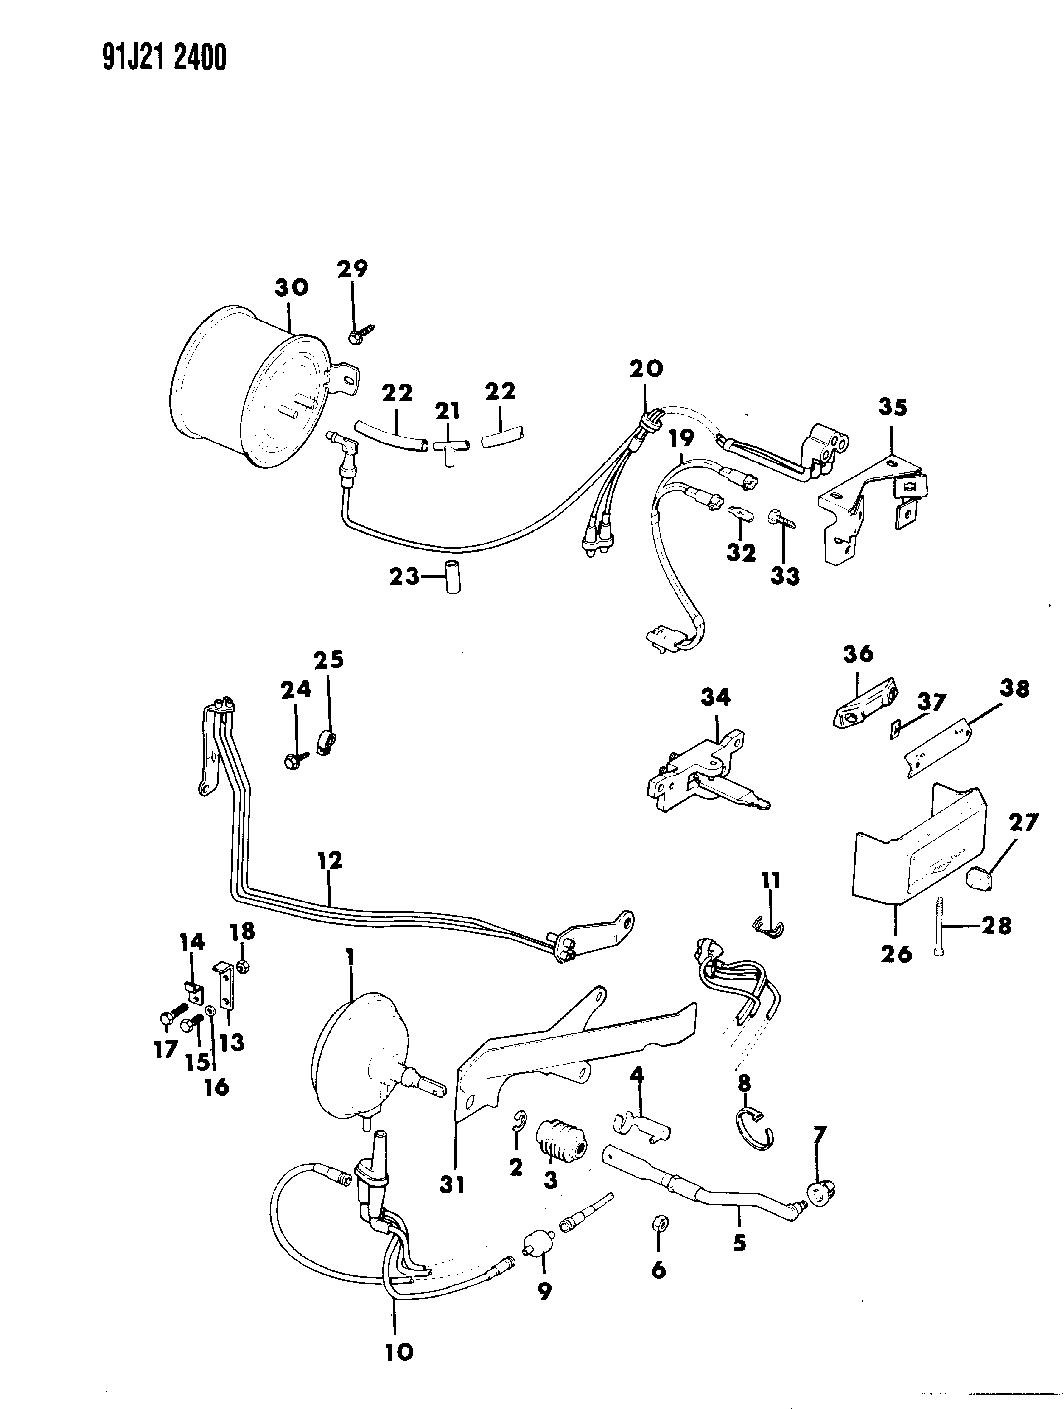 1991 Jeep Grand Wagoneer Controls Switch, Transfer Case Vacuum